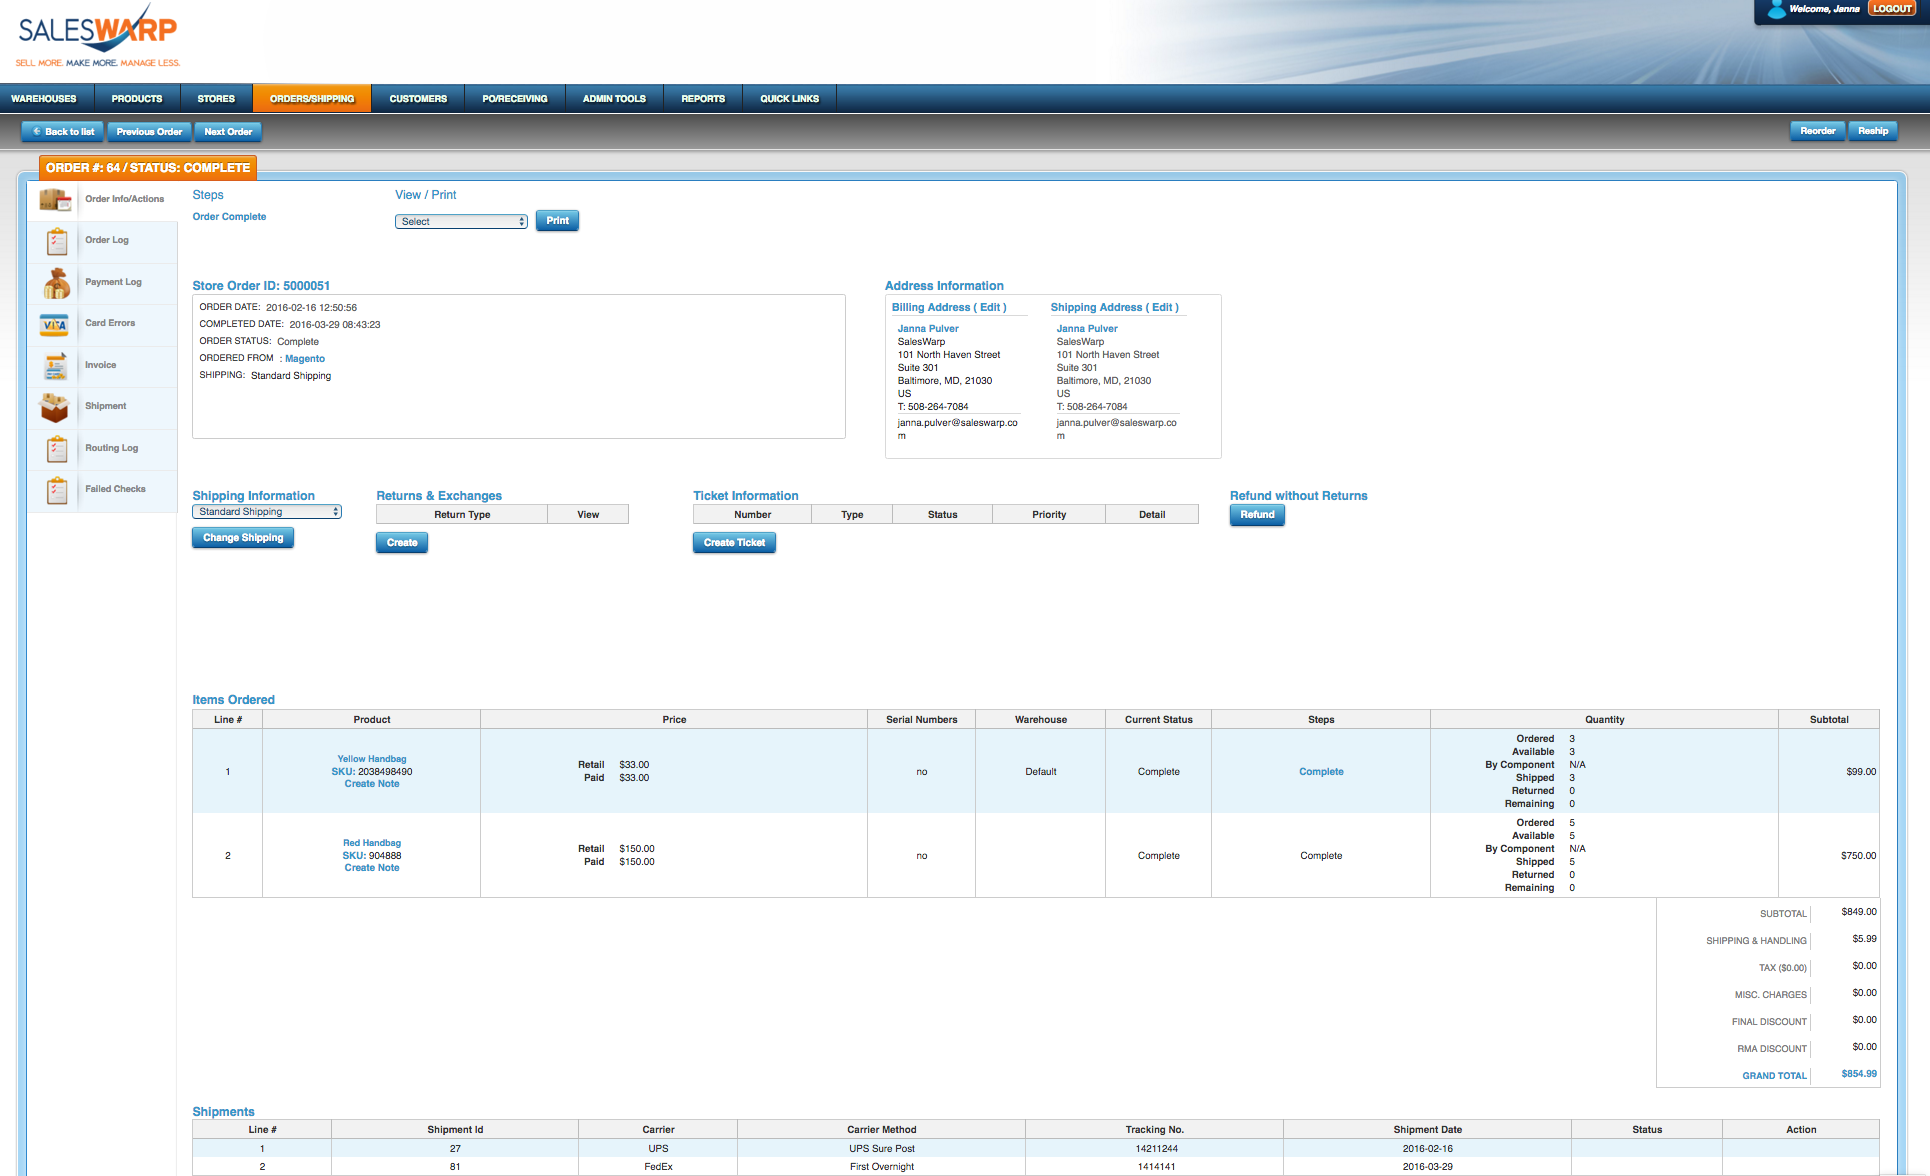 SalesWarp Demo - Order Detail